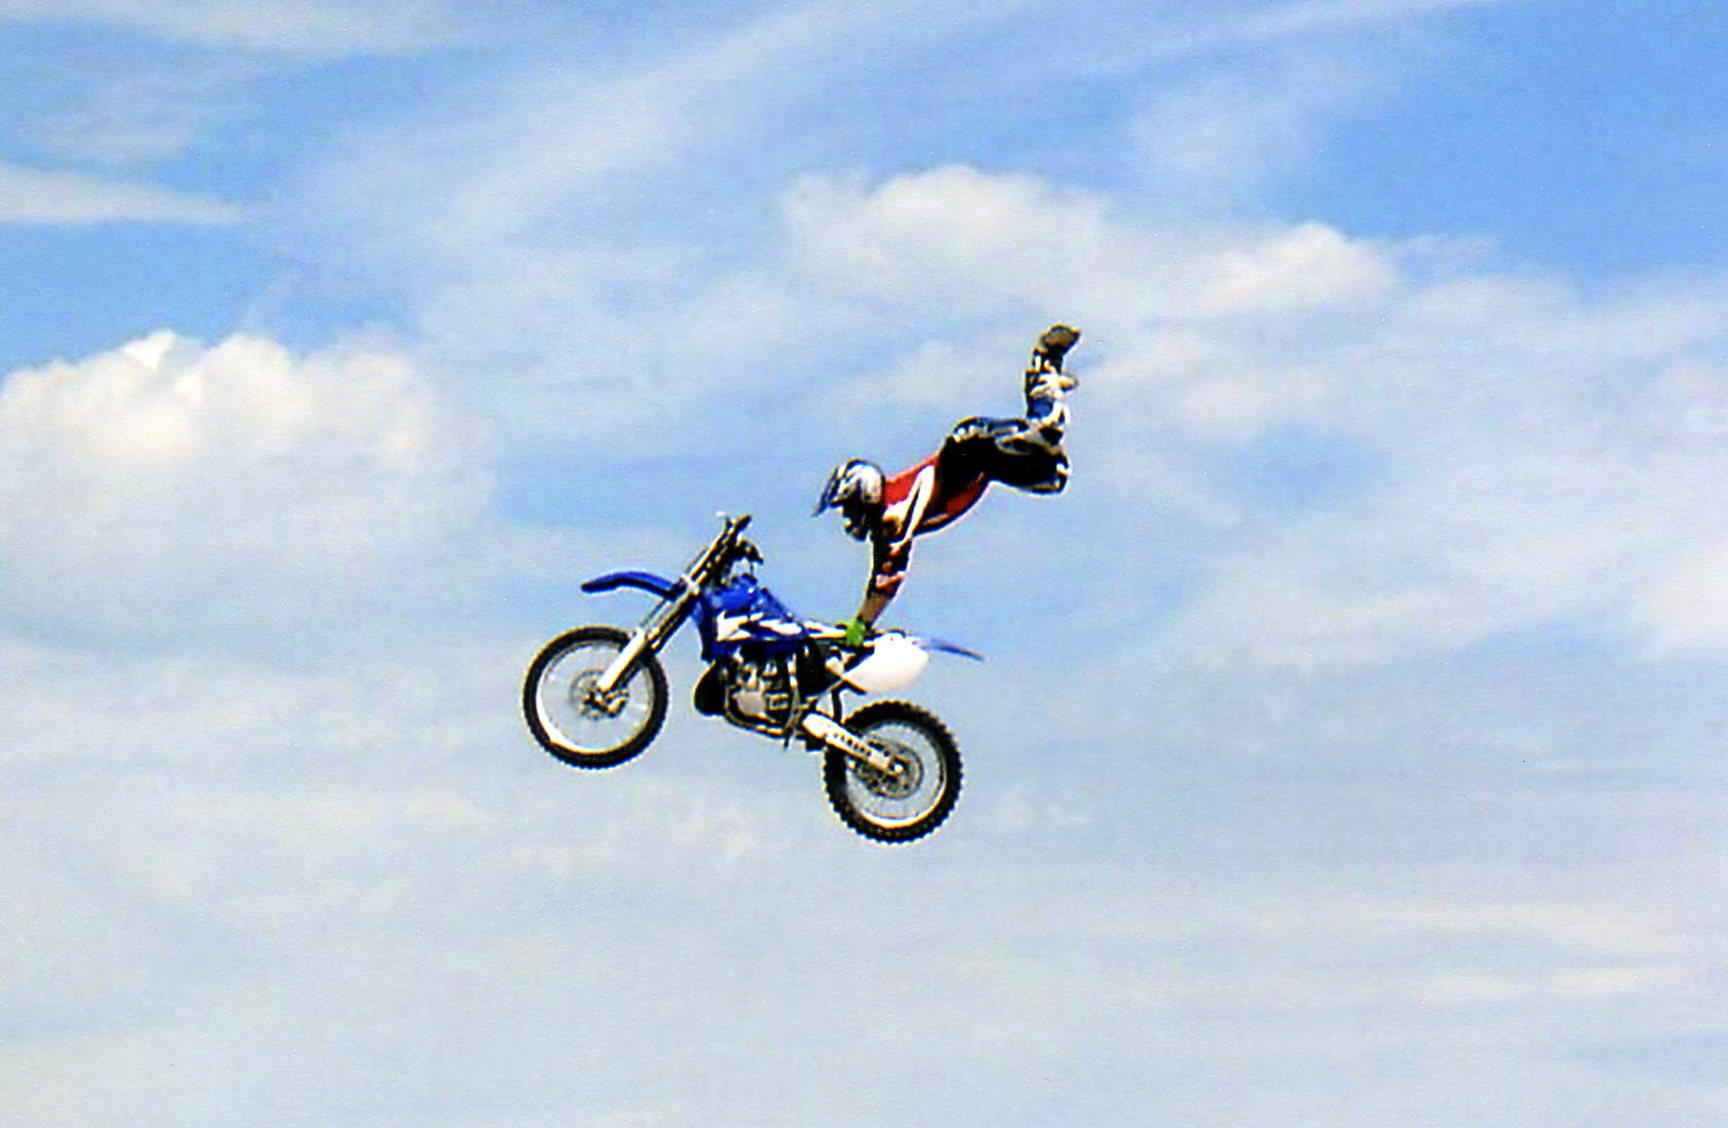 FMX Rodeo Trick